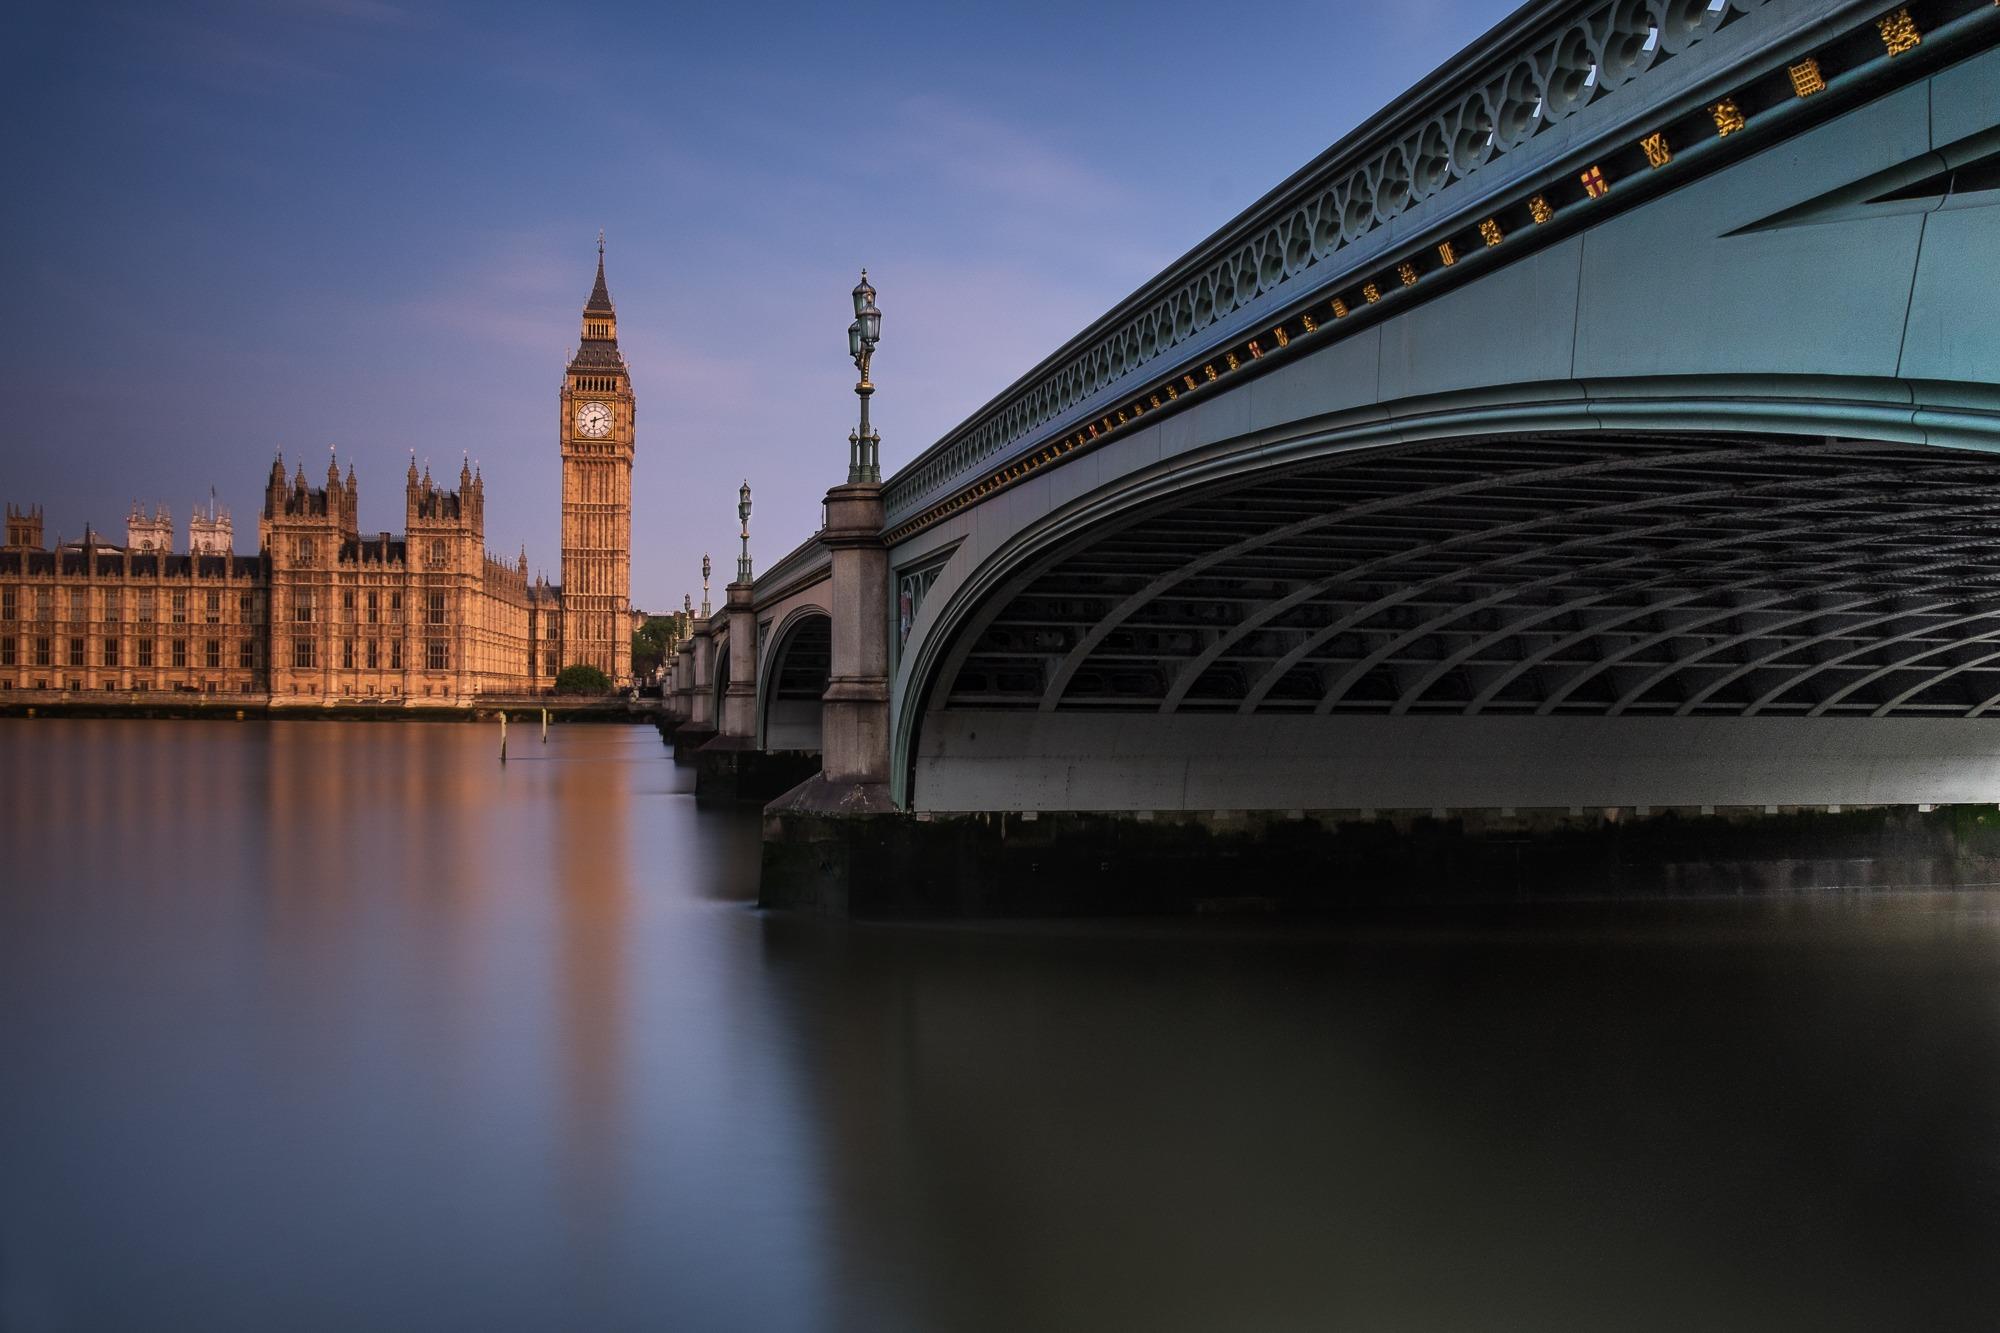 Under Westminster Bridge